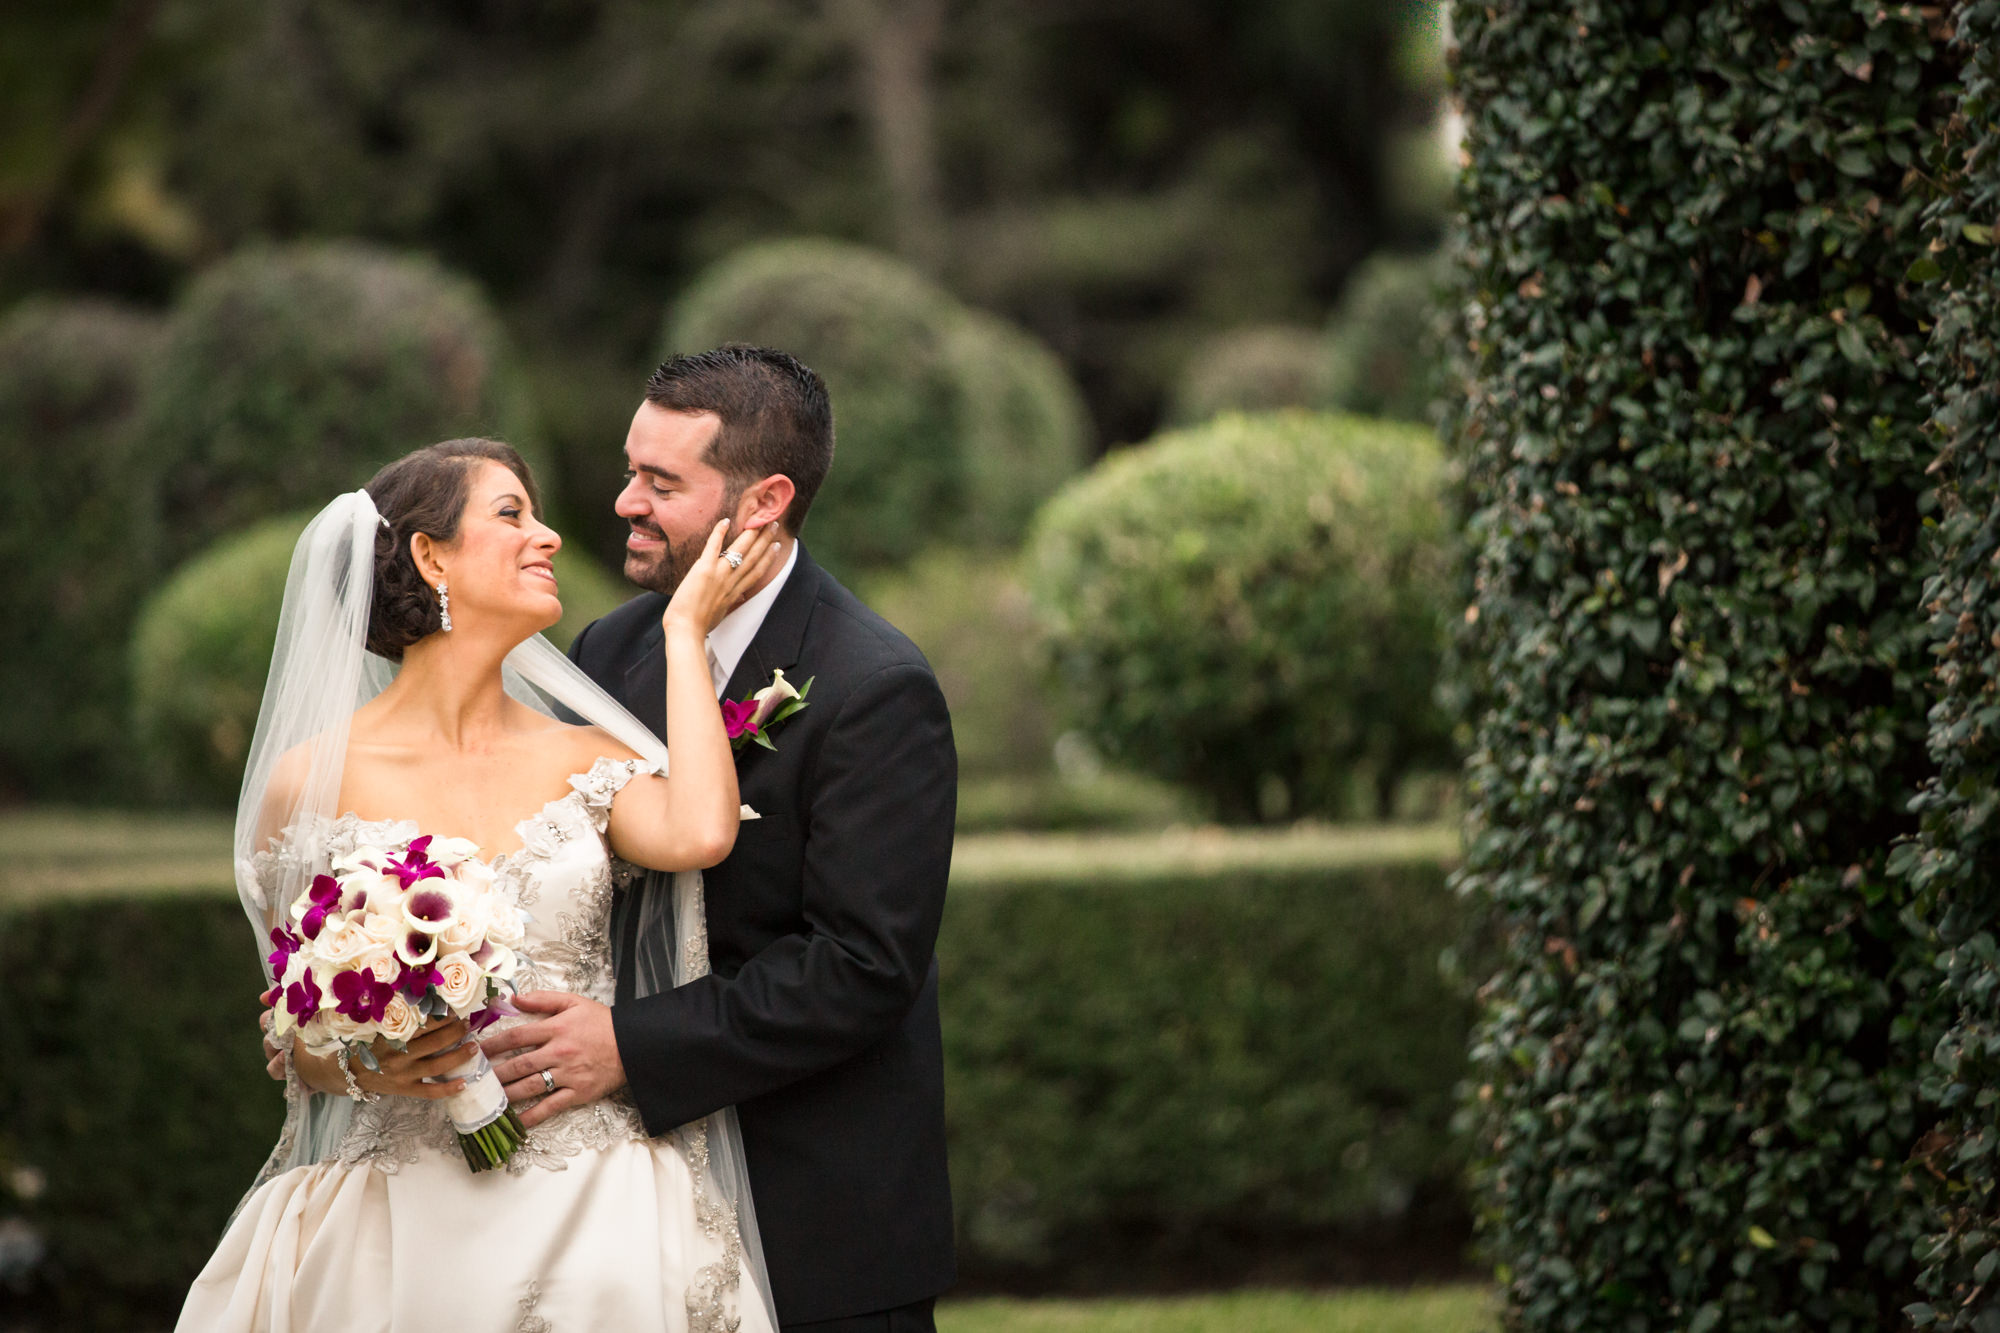 Benvenuto_Wedding_catholic_Florida_Bride-Groom-90.jpg